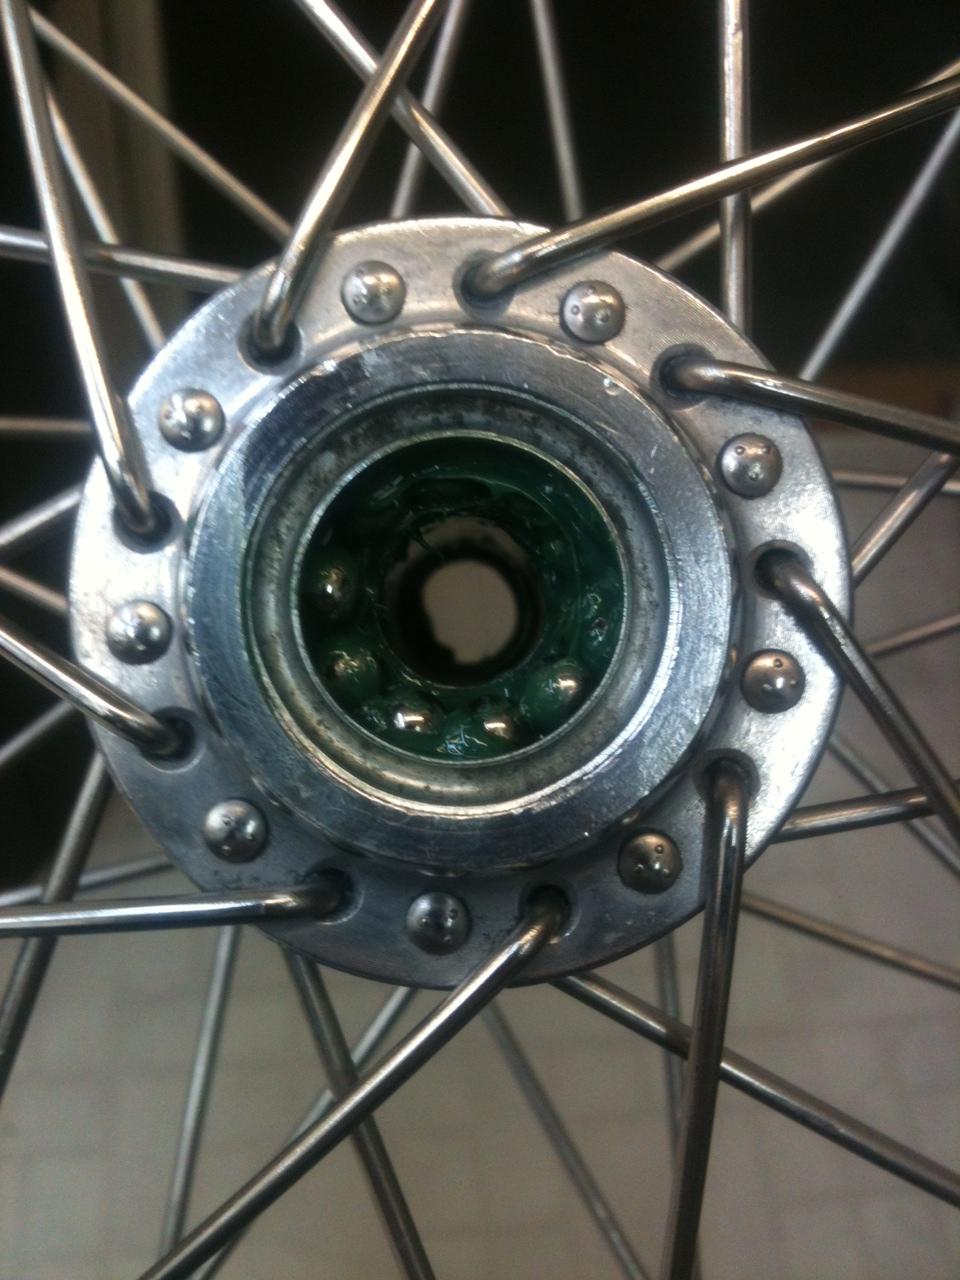 John S Bicycle Restorations Trek 400 Restored And Updated